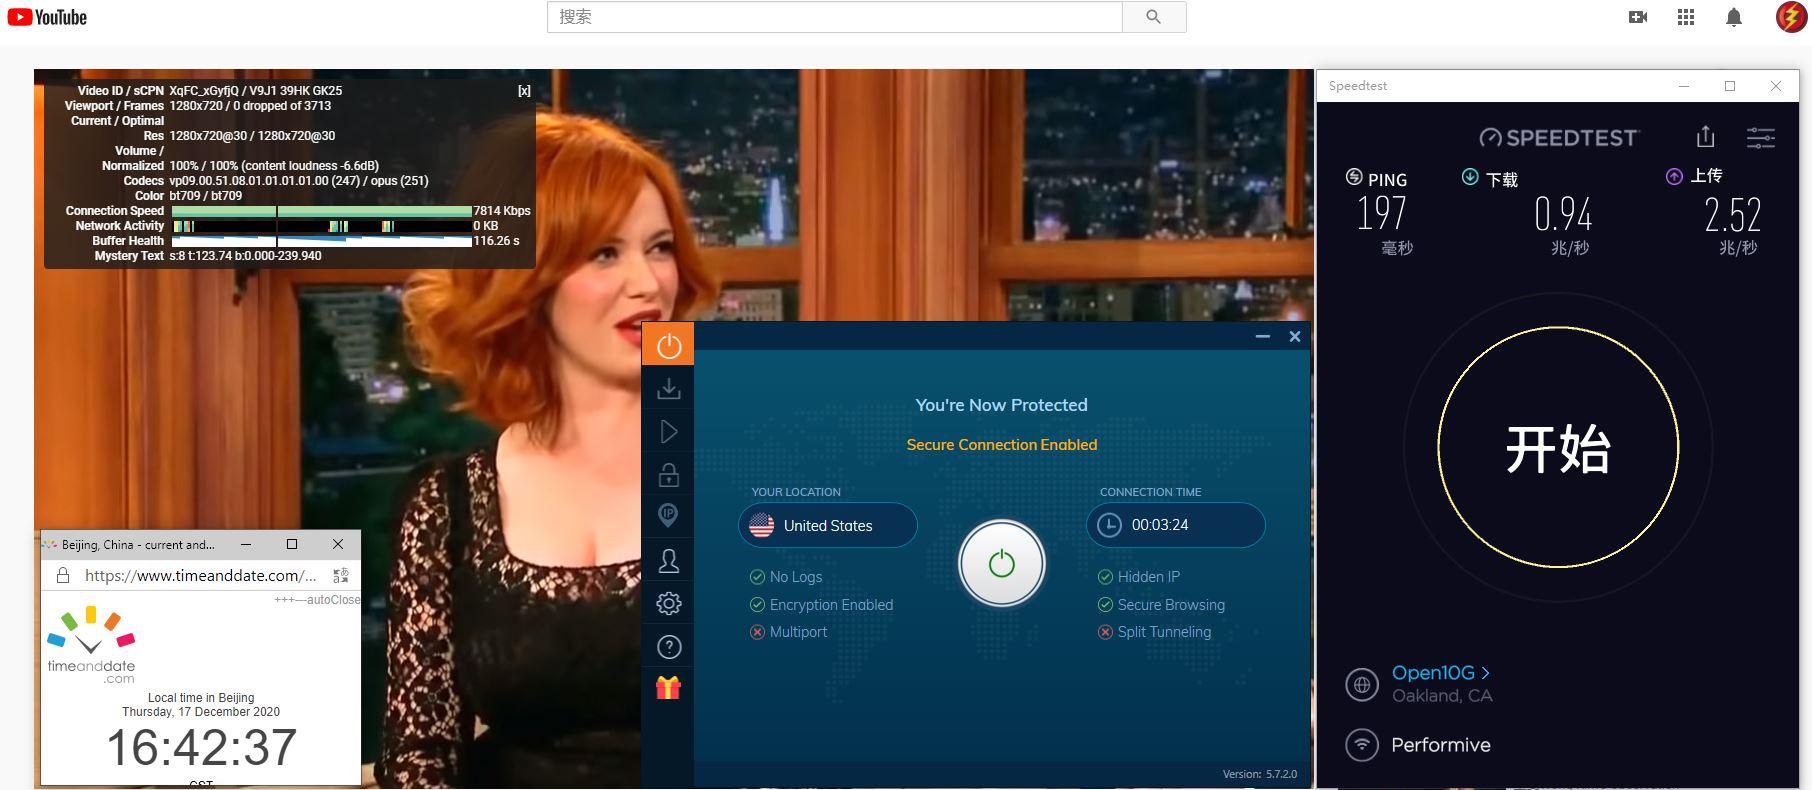 Windows10 IvacyVPN USA 服务器 中国VPN 翻墙 科学上网 测试 - 20201217